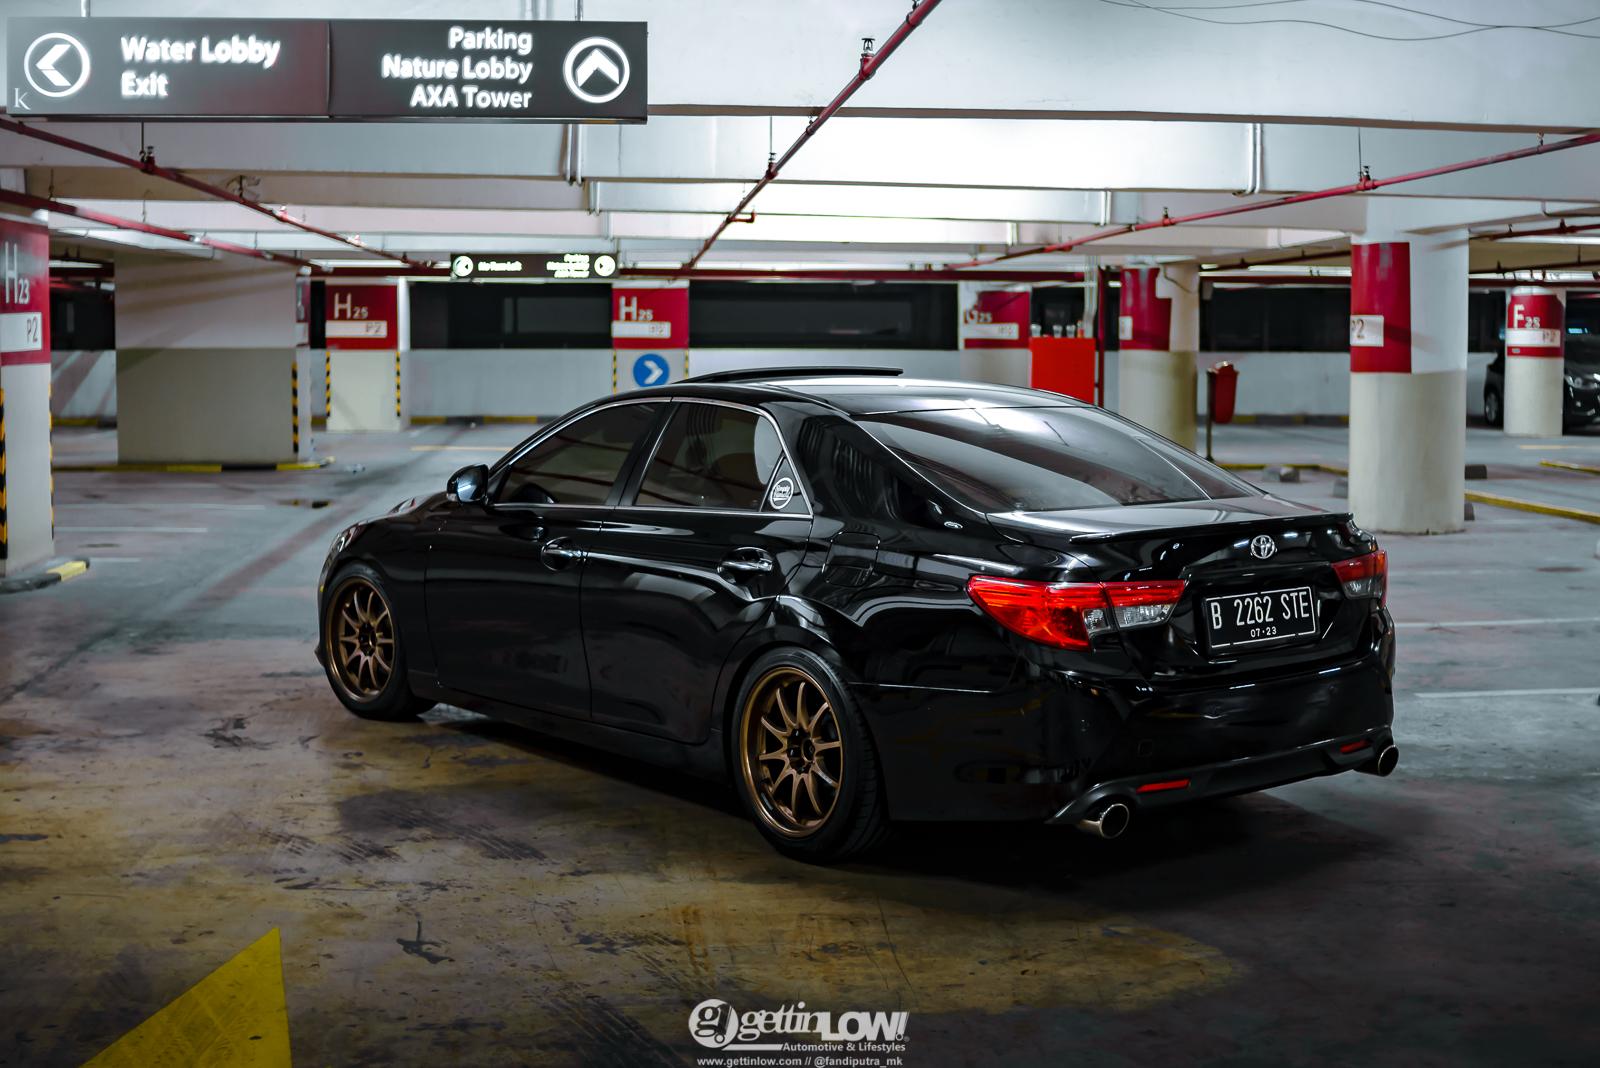 Rafiandra Lubis Toyota Mark X